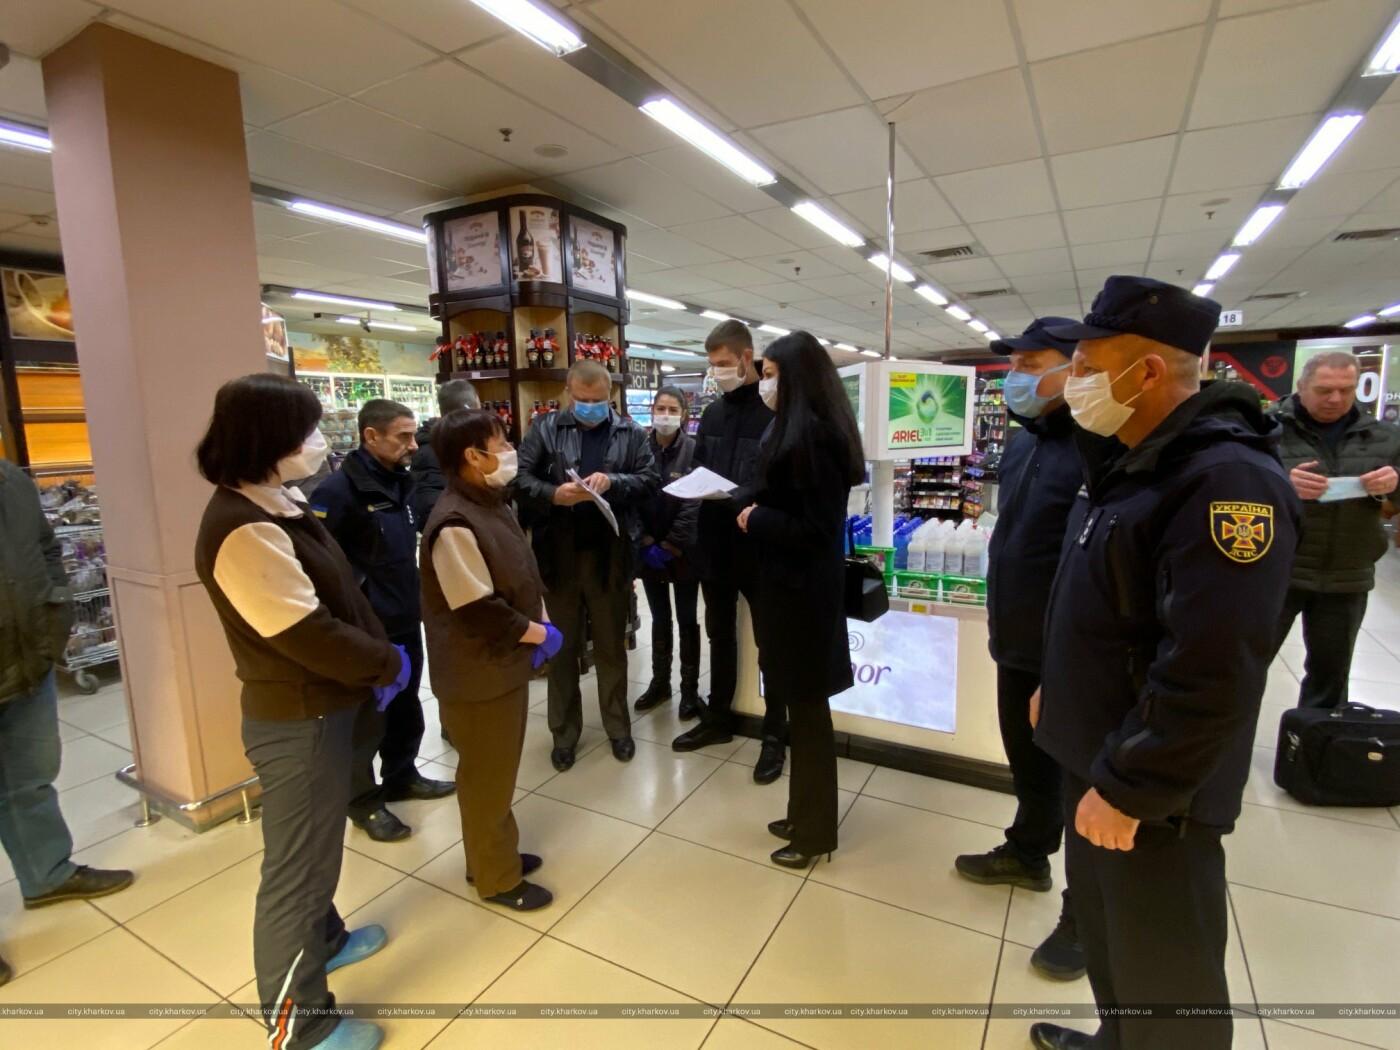 В Харькове проверили работу двух супермаркетов во время карантина, - ФОТО, фото-1